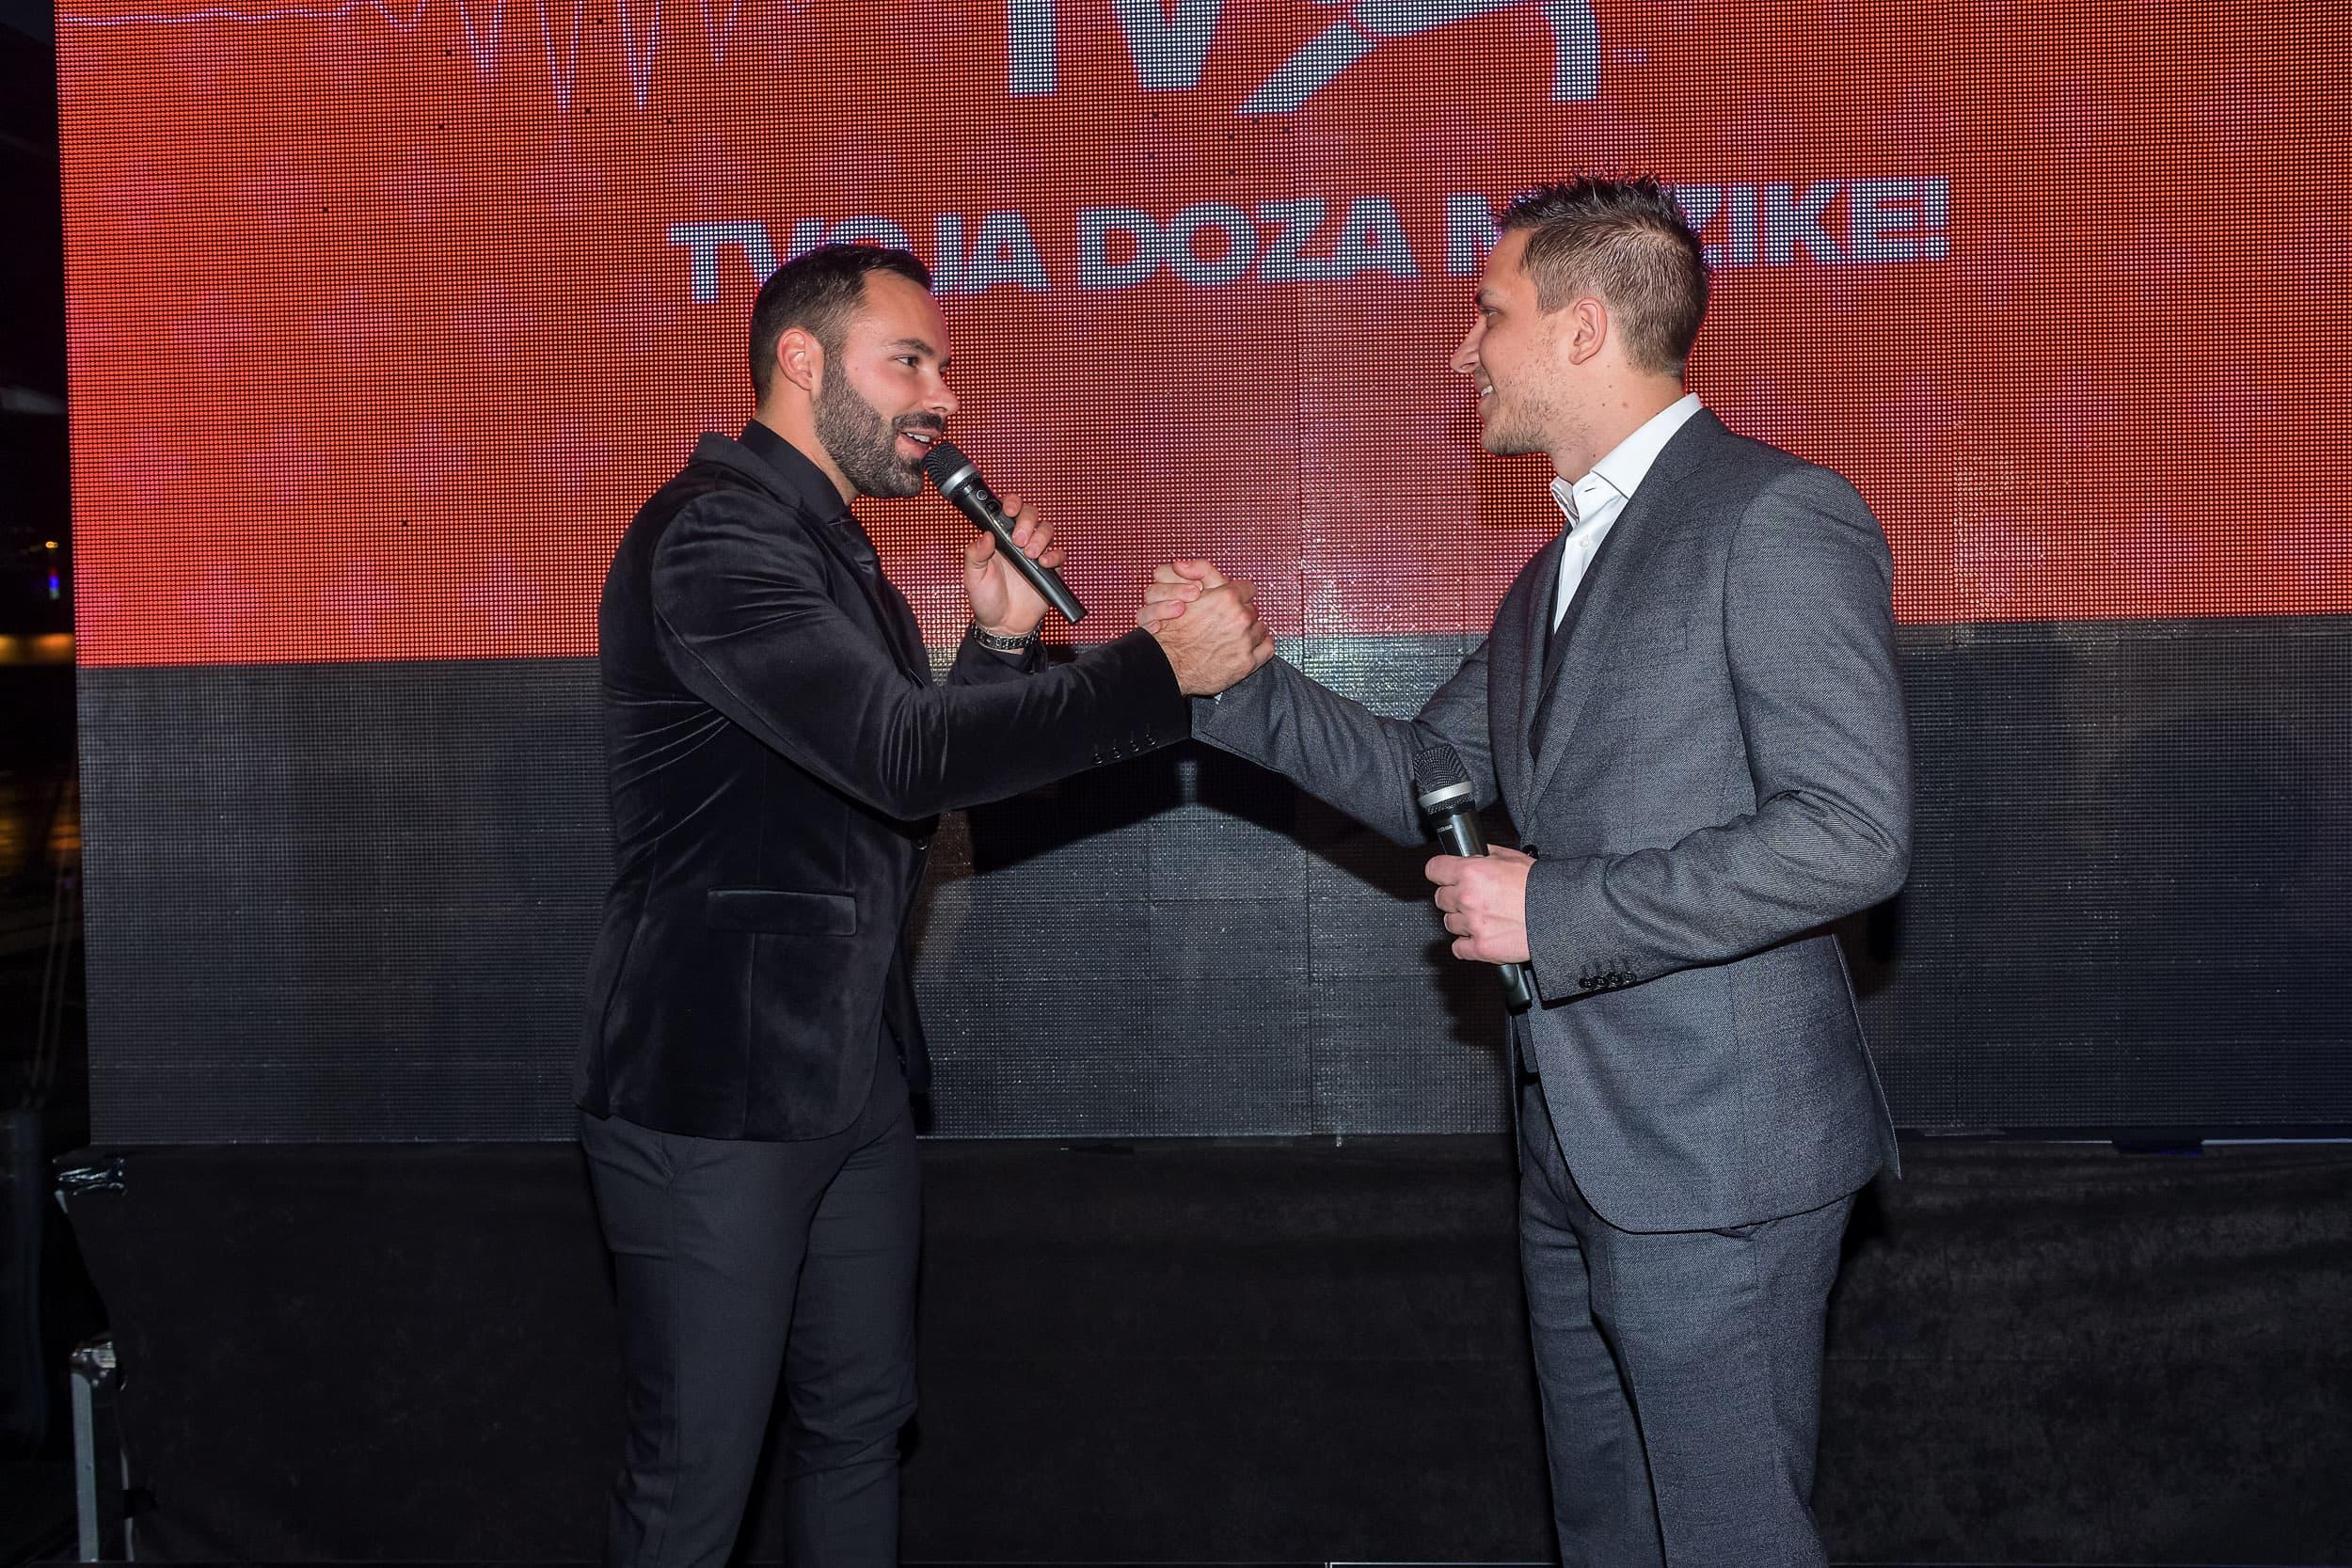 Osnivači IDJ televizije, Andrej Ilic Djordje Trbovic (foto: PR)